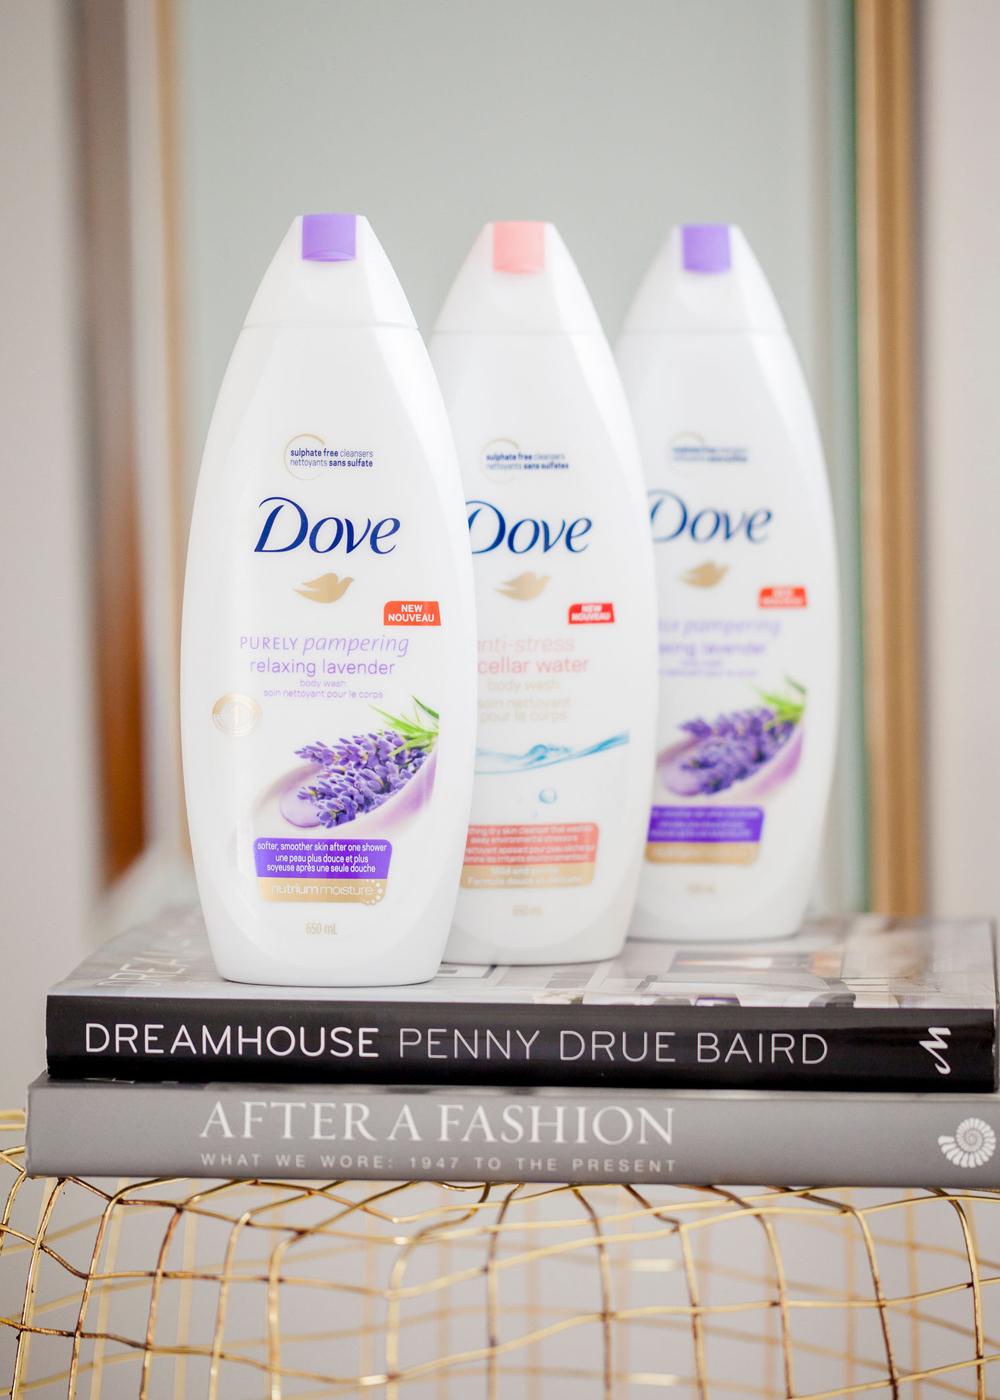 beaute-blogue-blogueuse-dove-canada-soins-peau